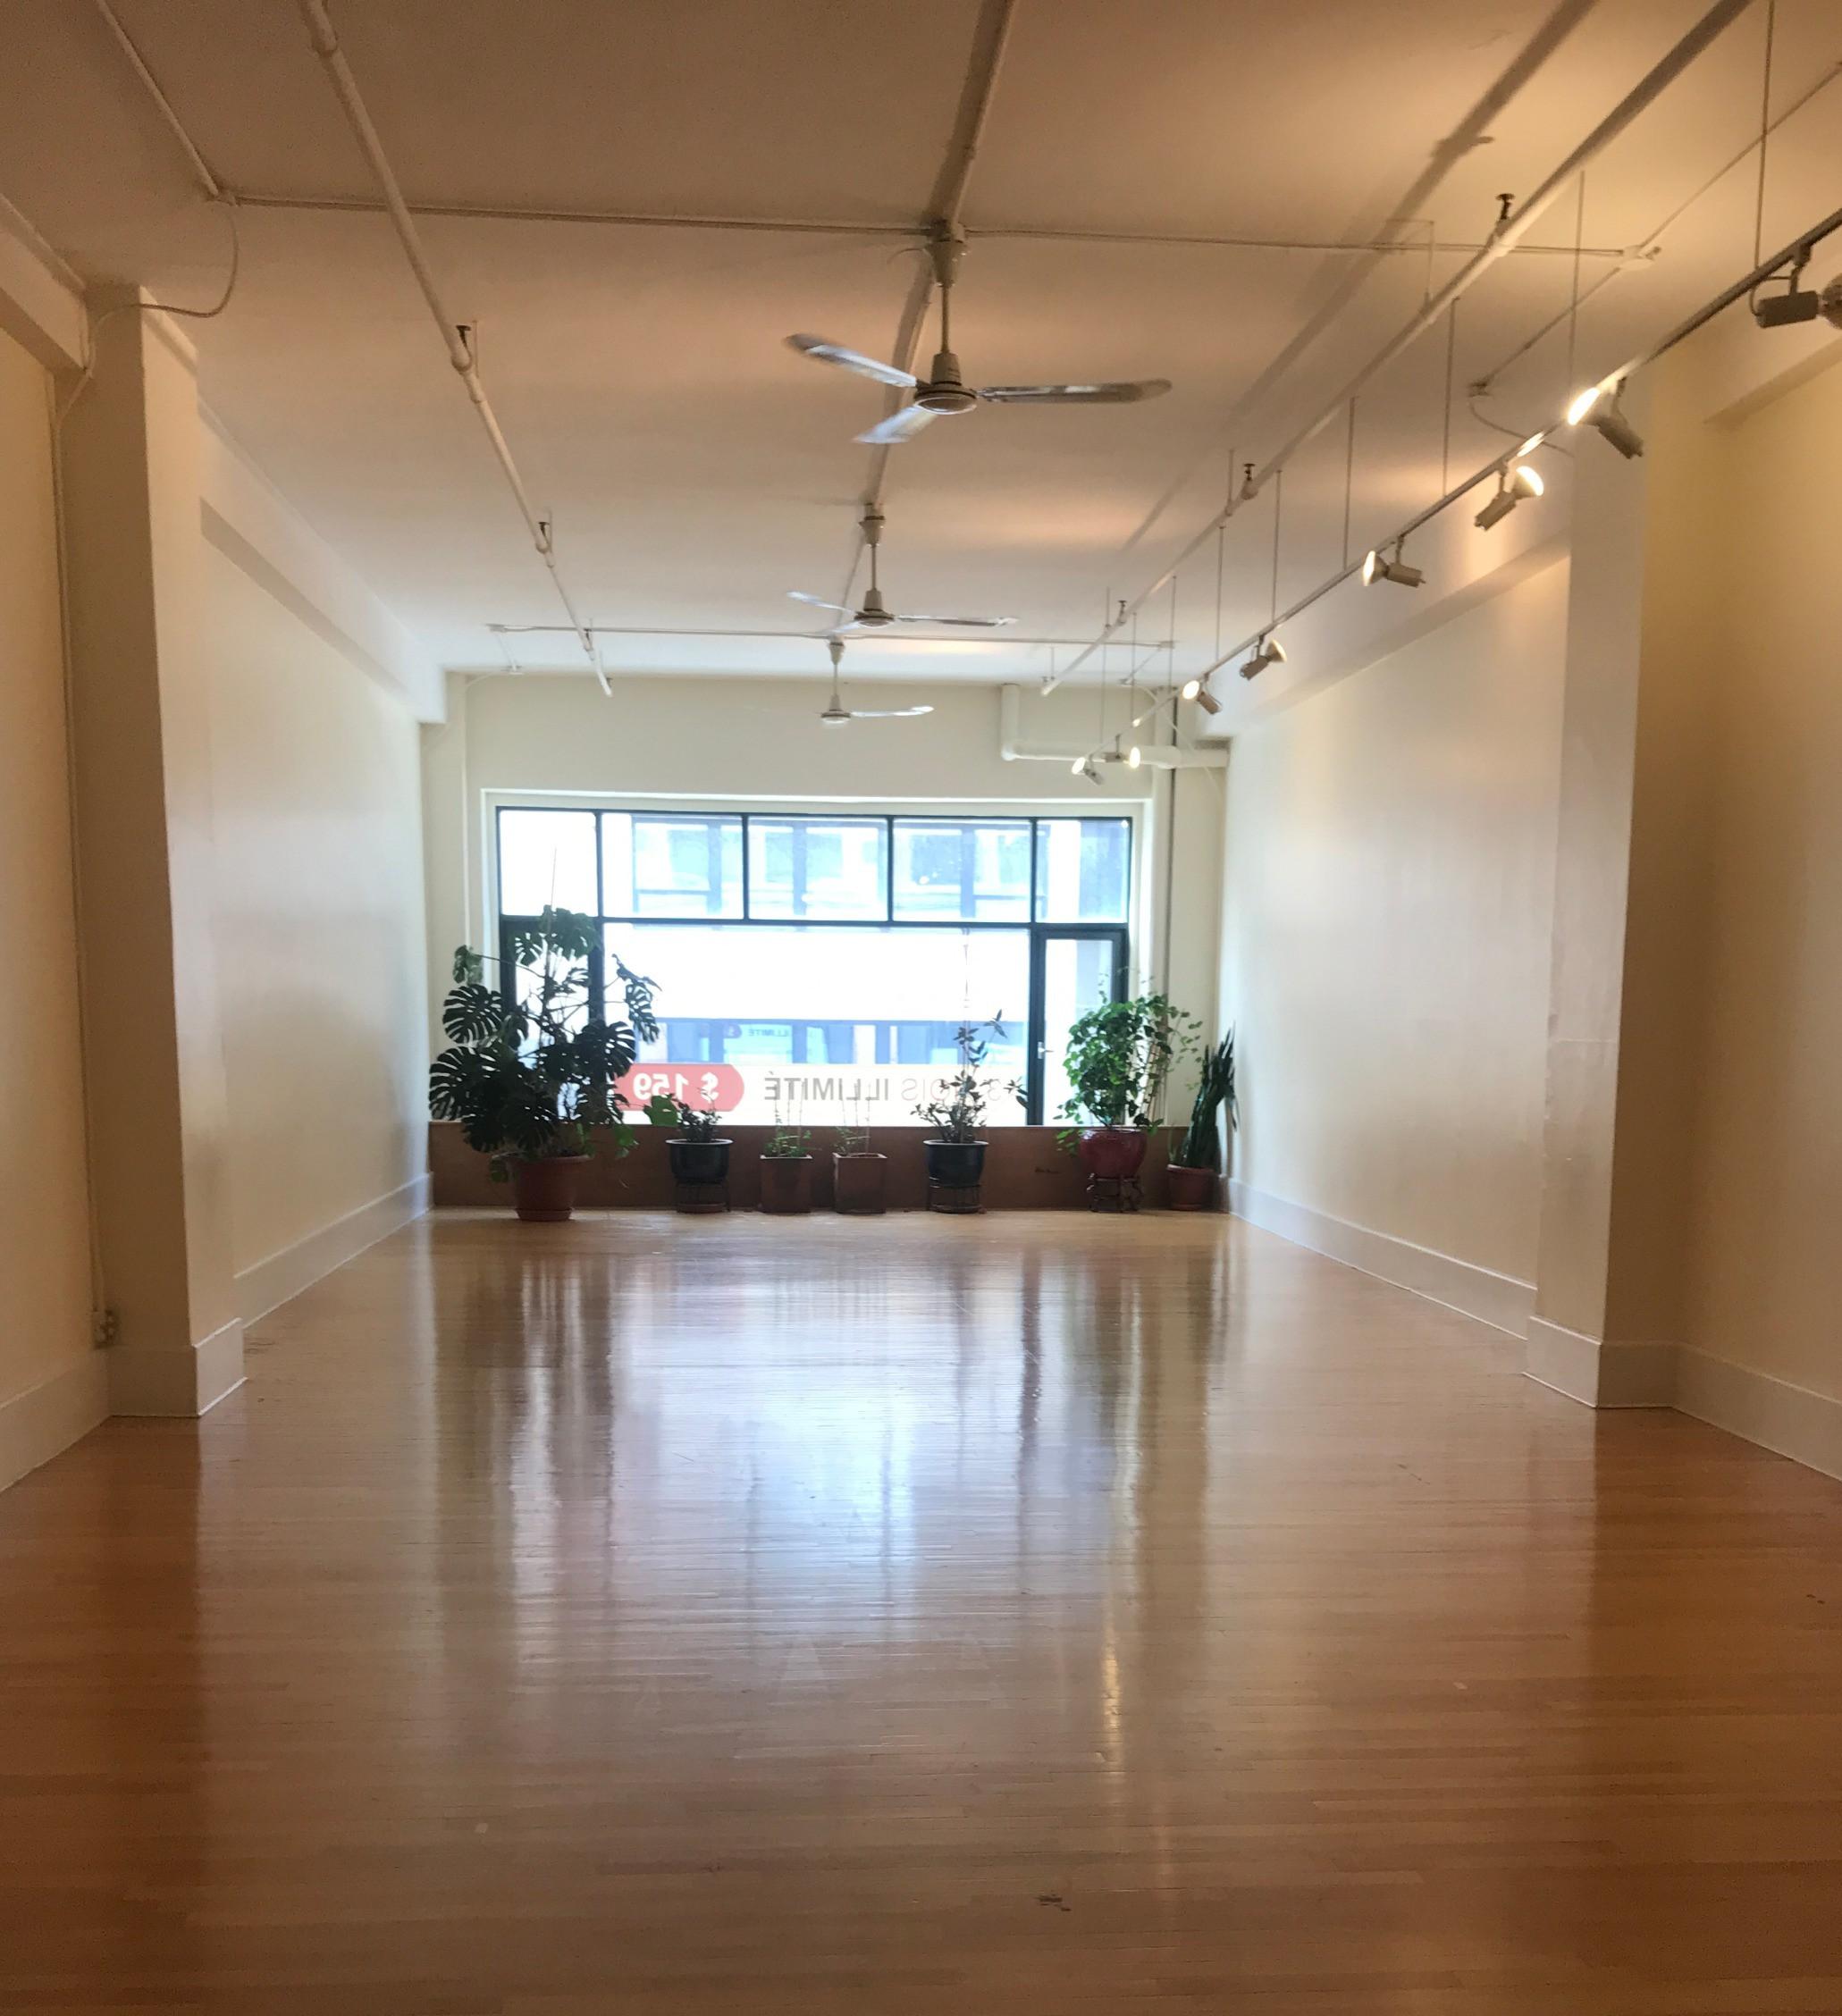 The Intimate Studio